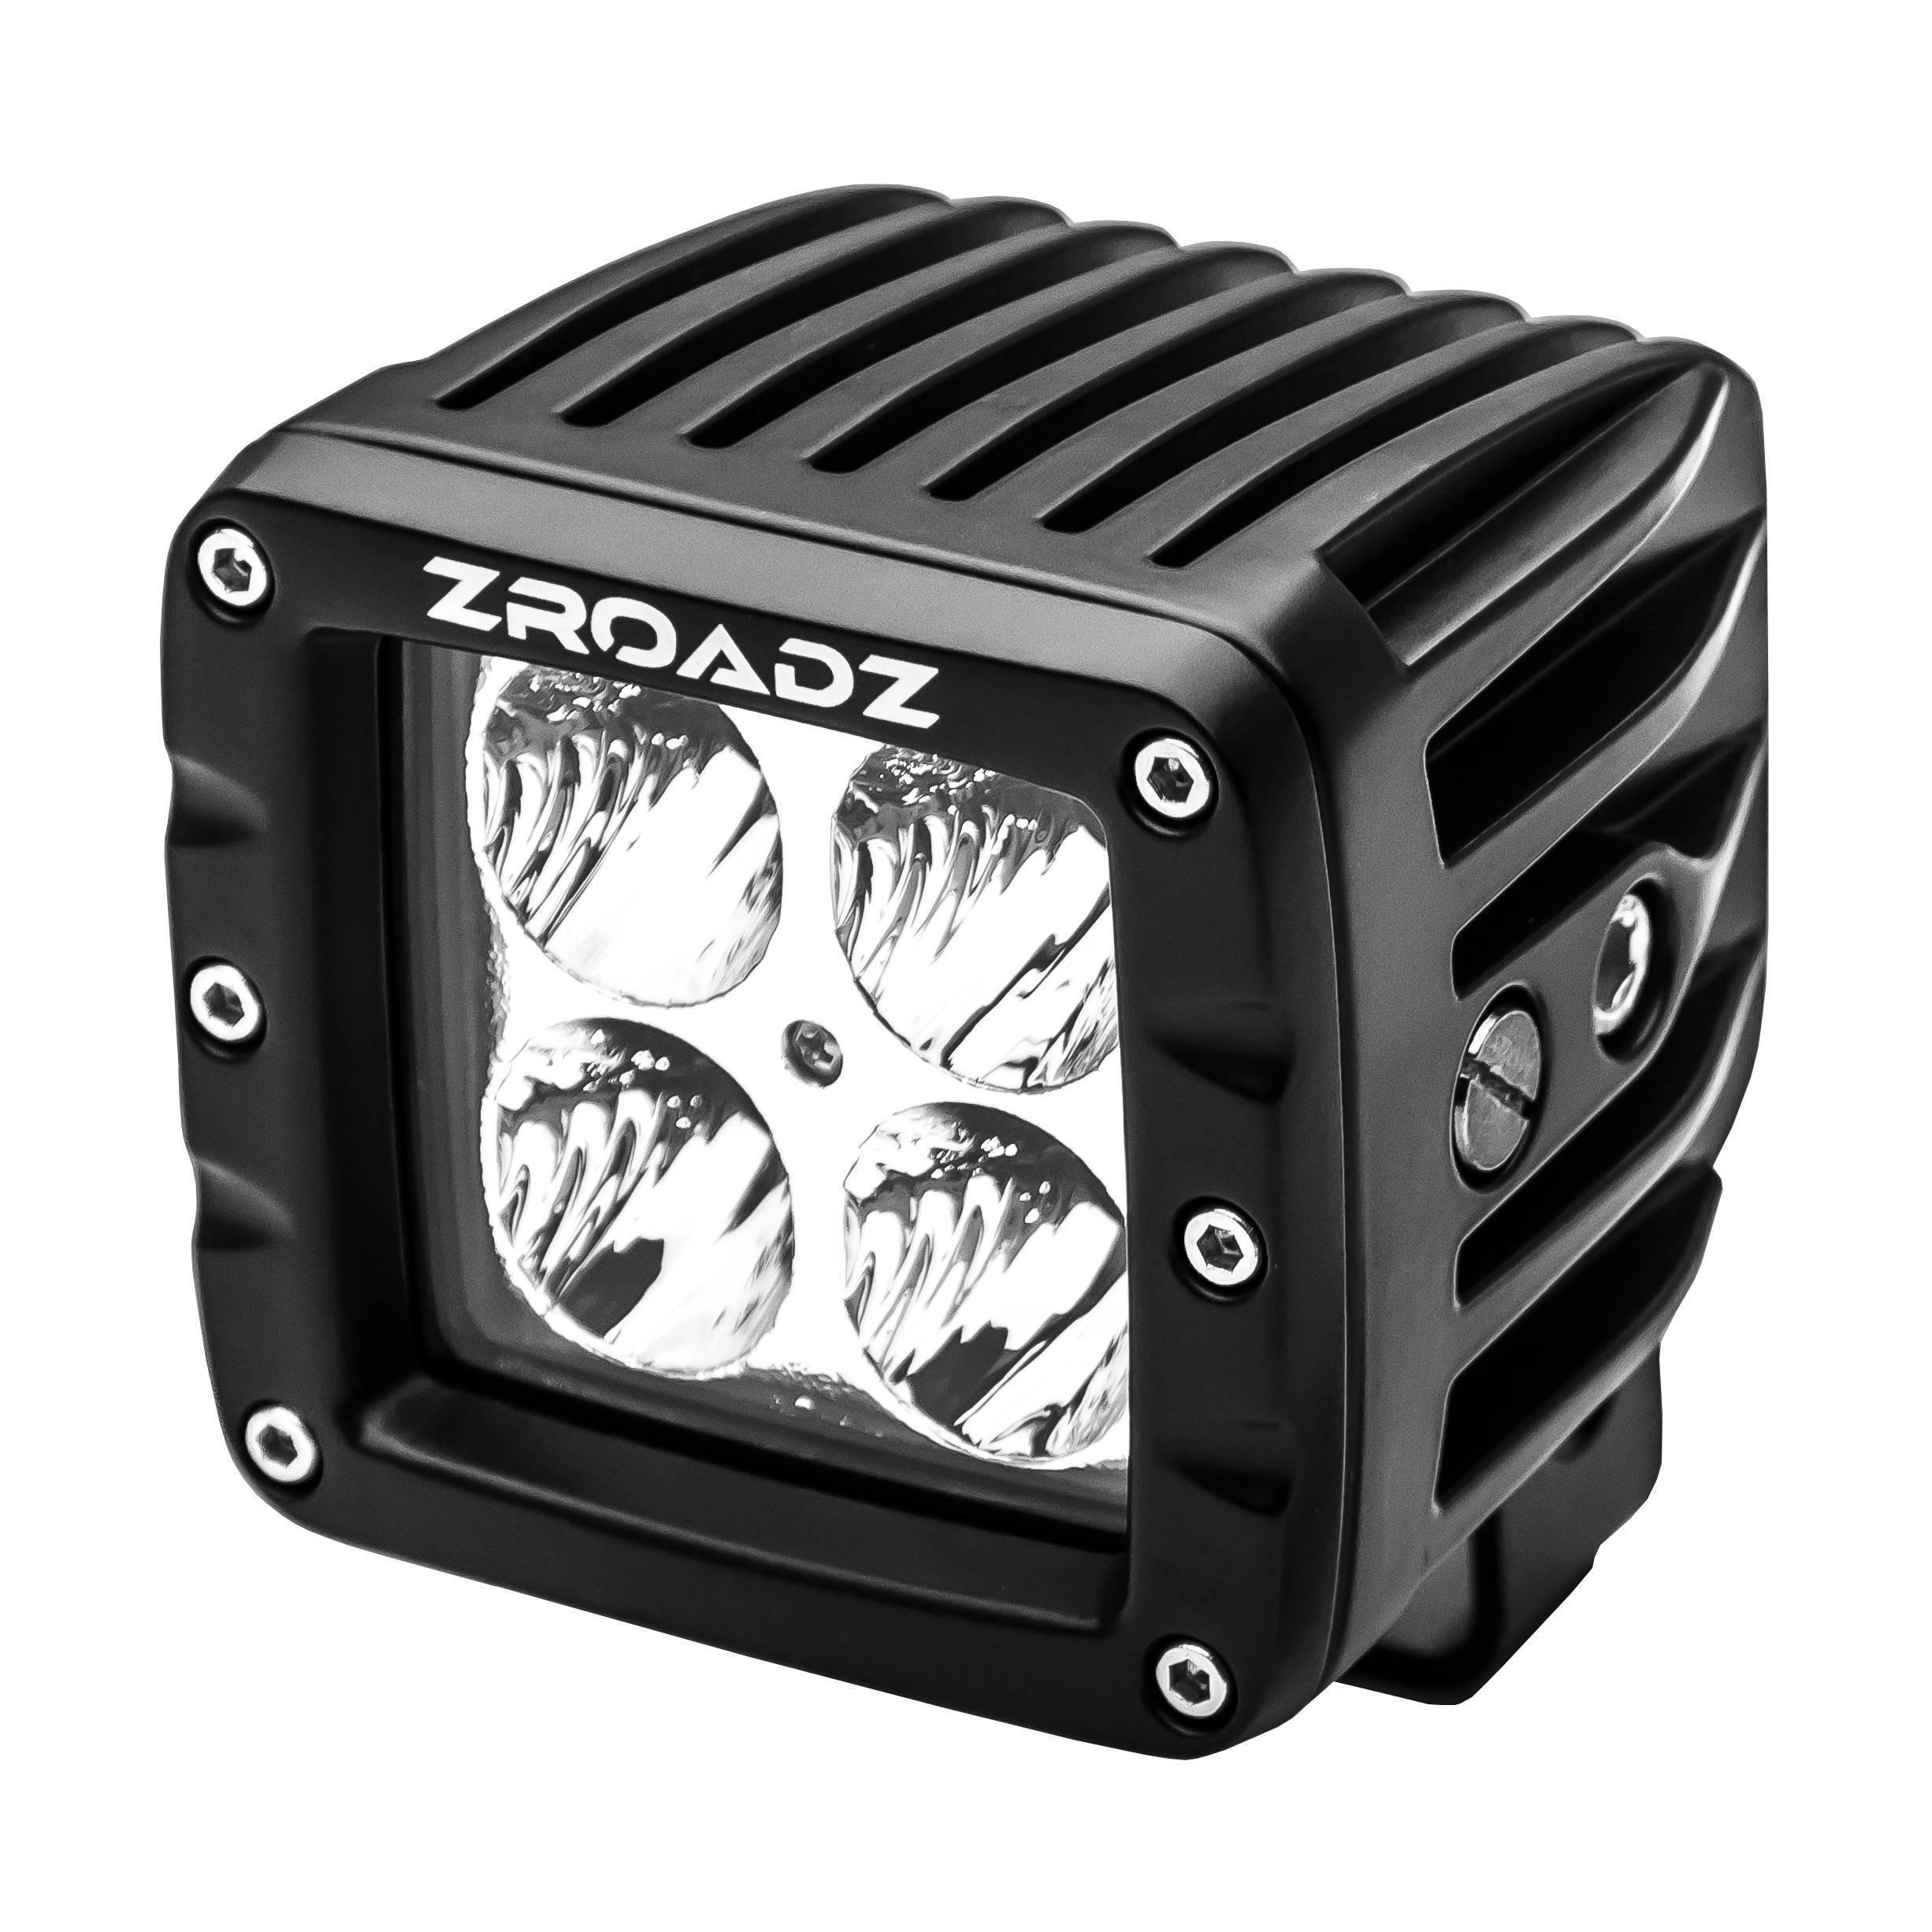 ZROADZ OFF ROAD PRODUCTS - 3 Inch LED Flood Beam Pod Lights - PN #Z30BC14W20